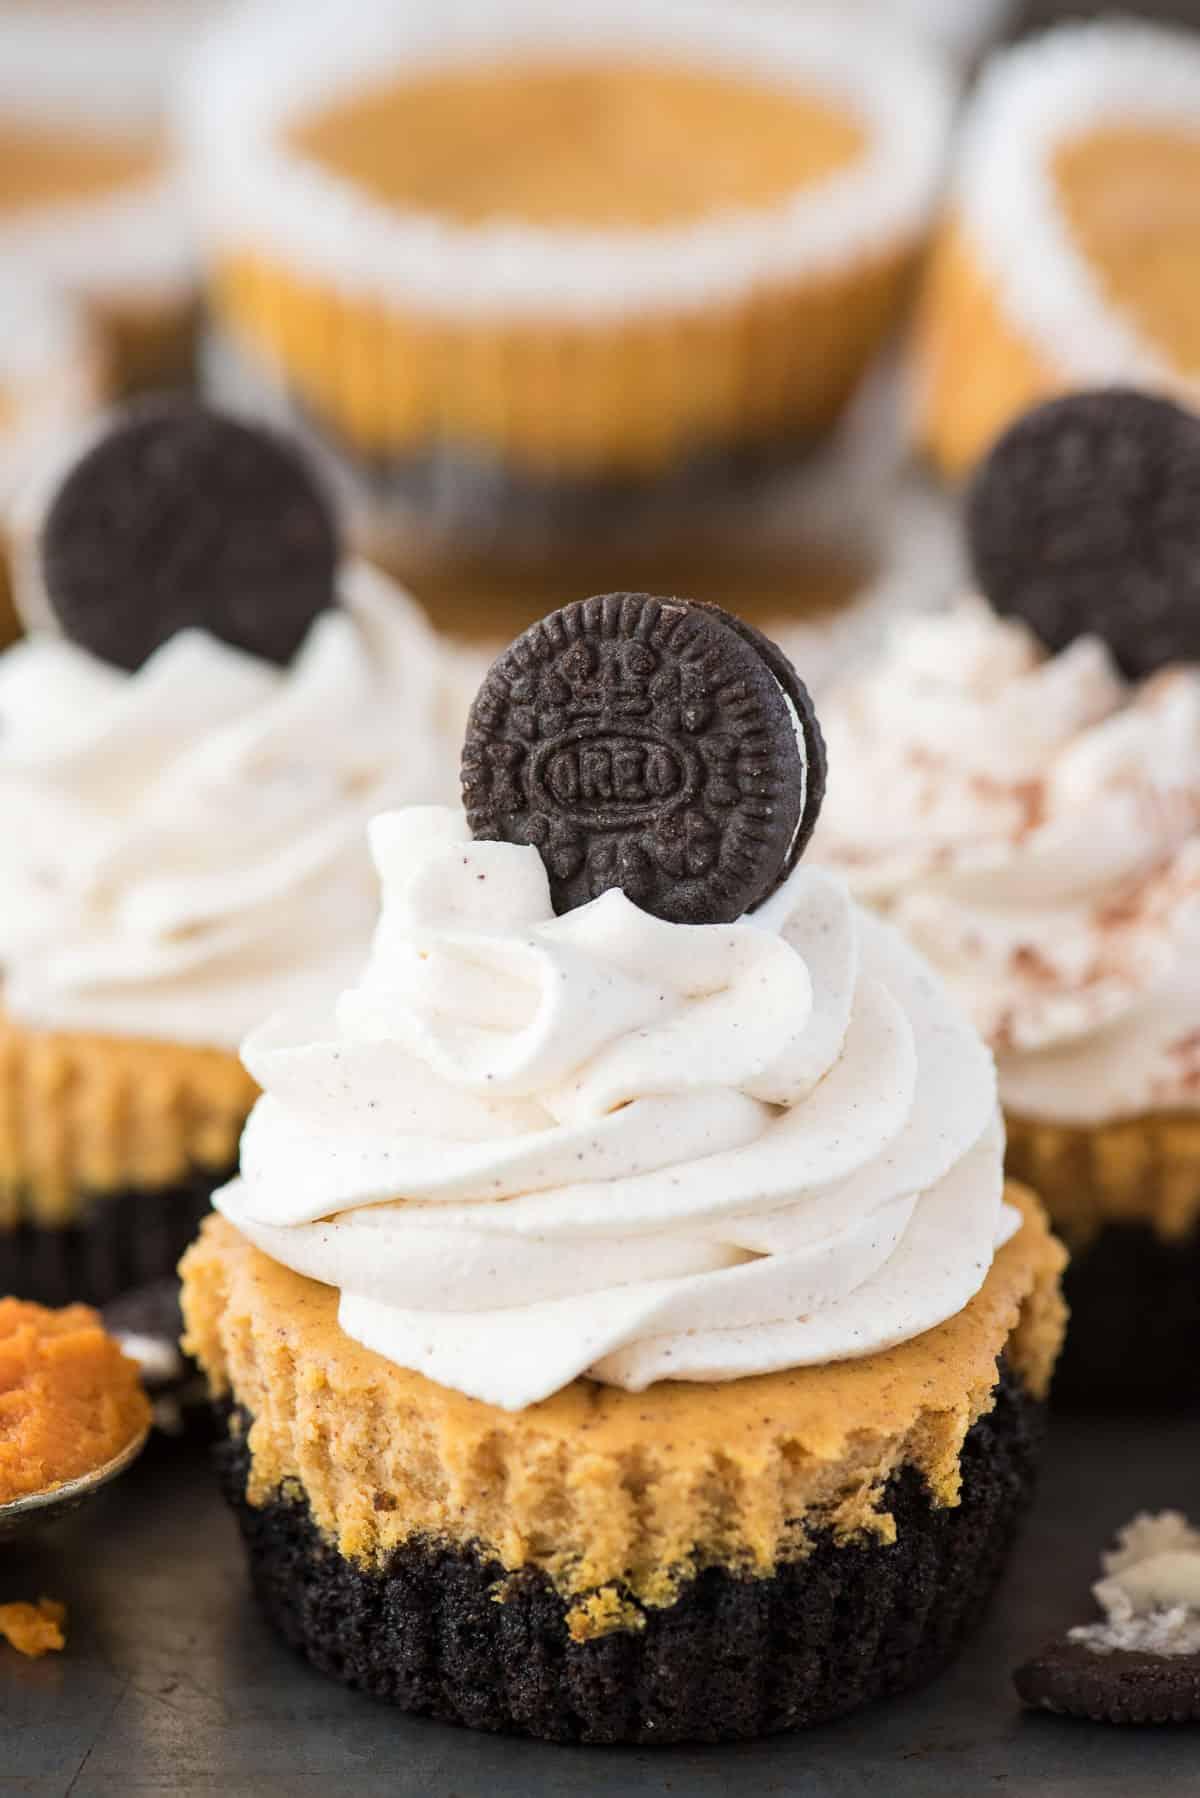 mini pumpkin cheesecake with oreo cookie crust with swirl of whipping cream and mini oreo on top